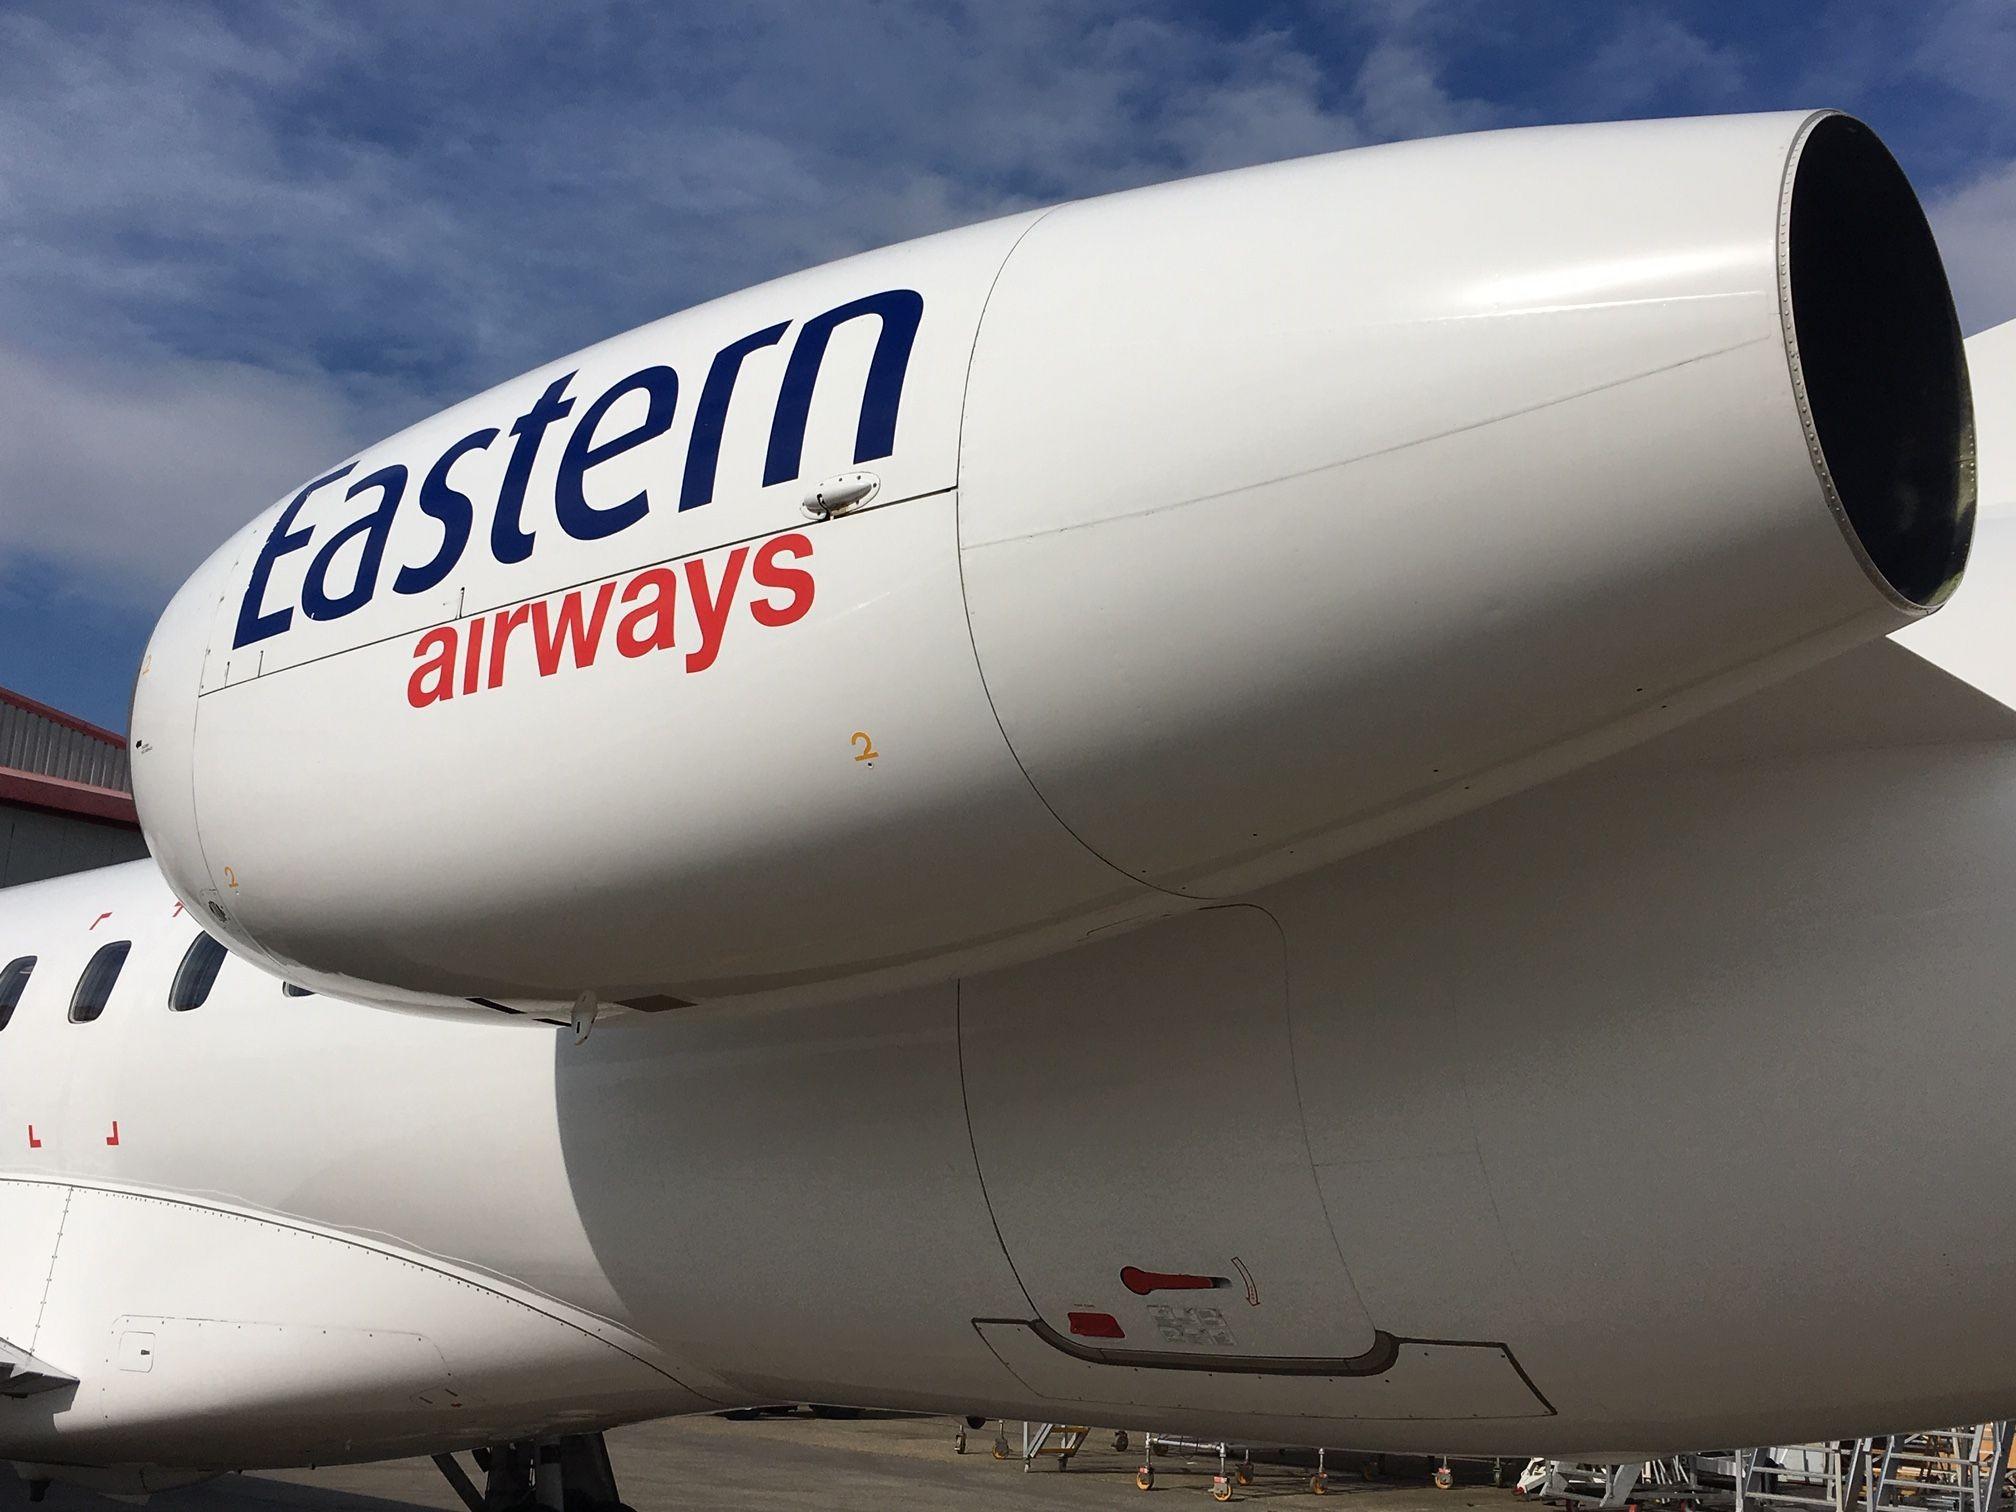 Eastern Airways (UK) Ltd   LinkedIn